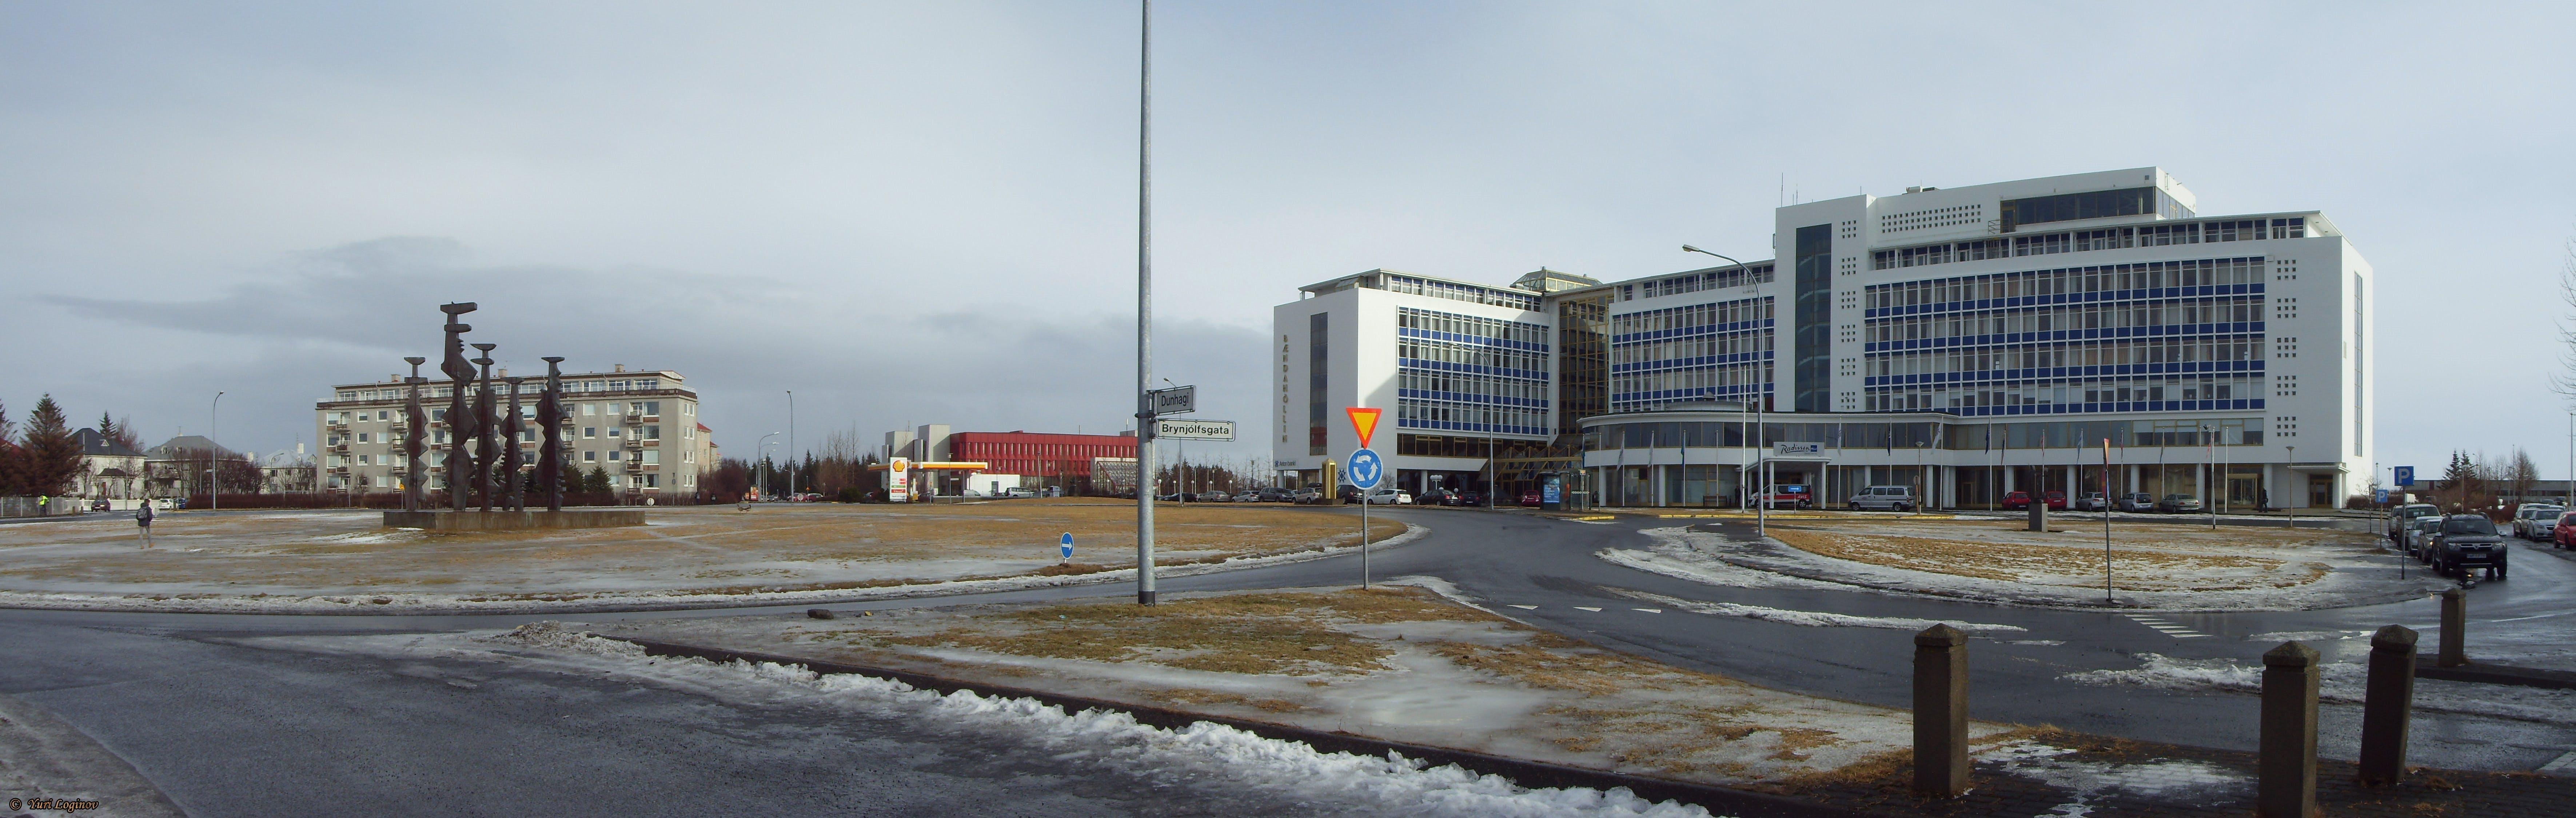 Free stock photo of iceland, island, reykjavik, Radisson Blu Saga Hotel